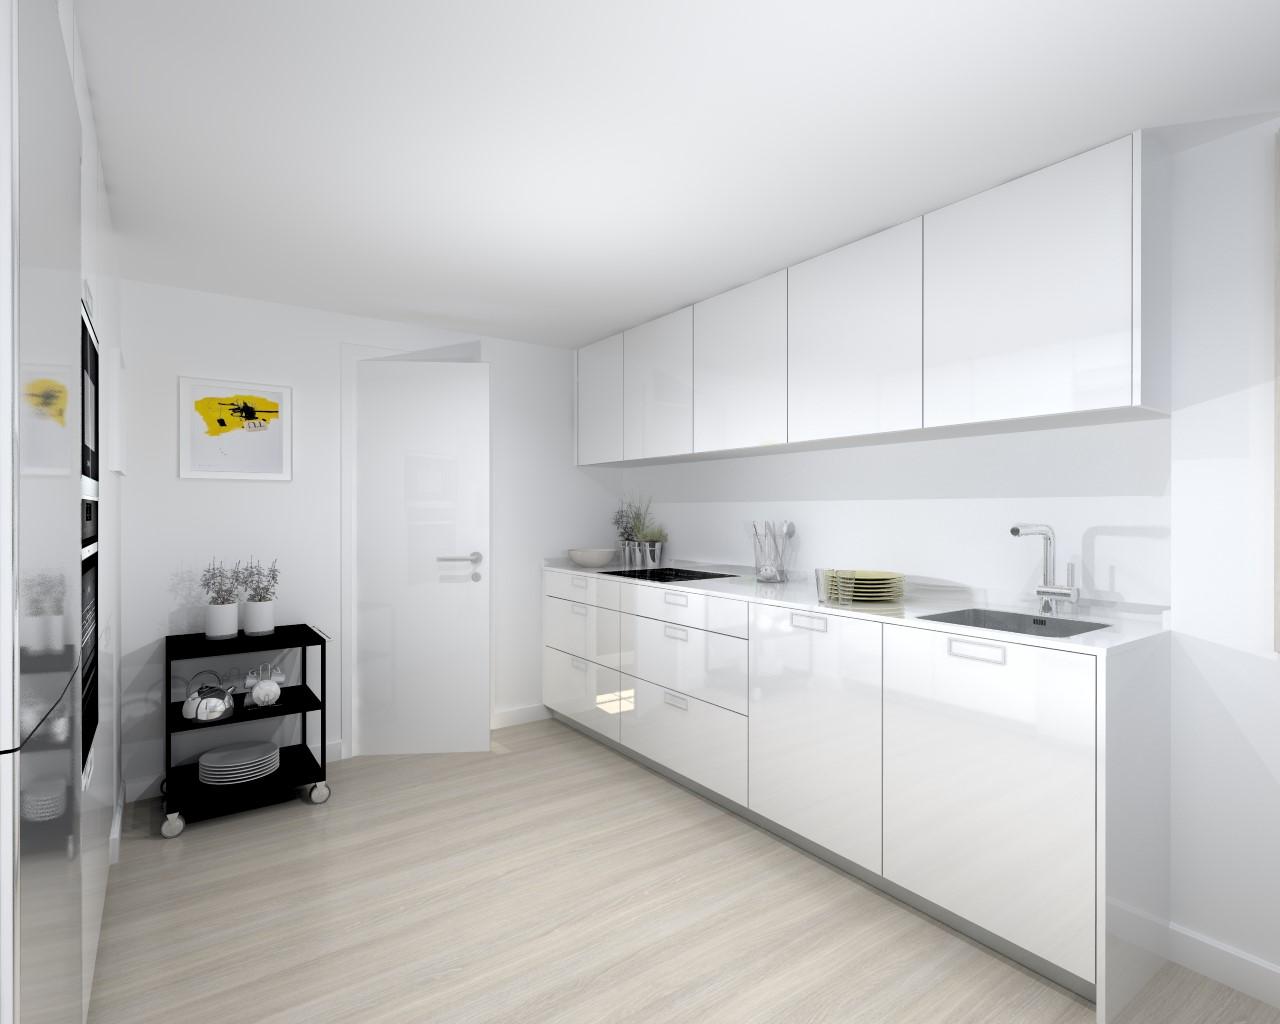 Cocina santos modelo line l blanco brillo estudio cocinas dc for Muebles de cocina xey modelo capri